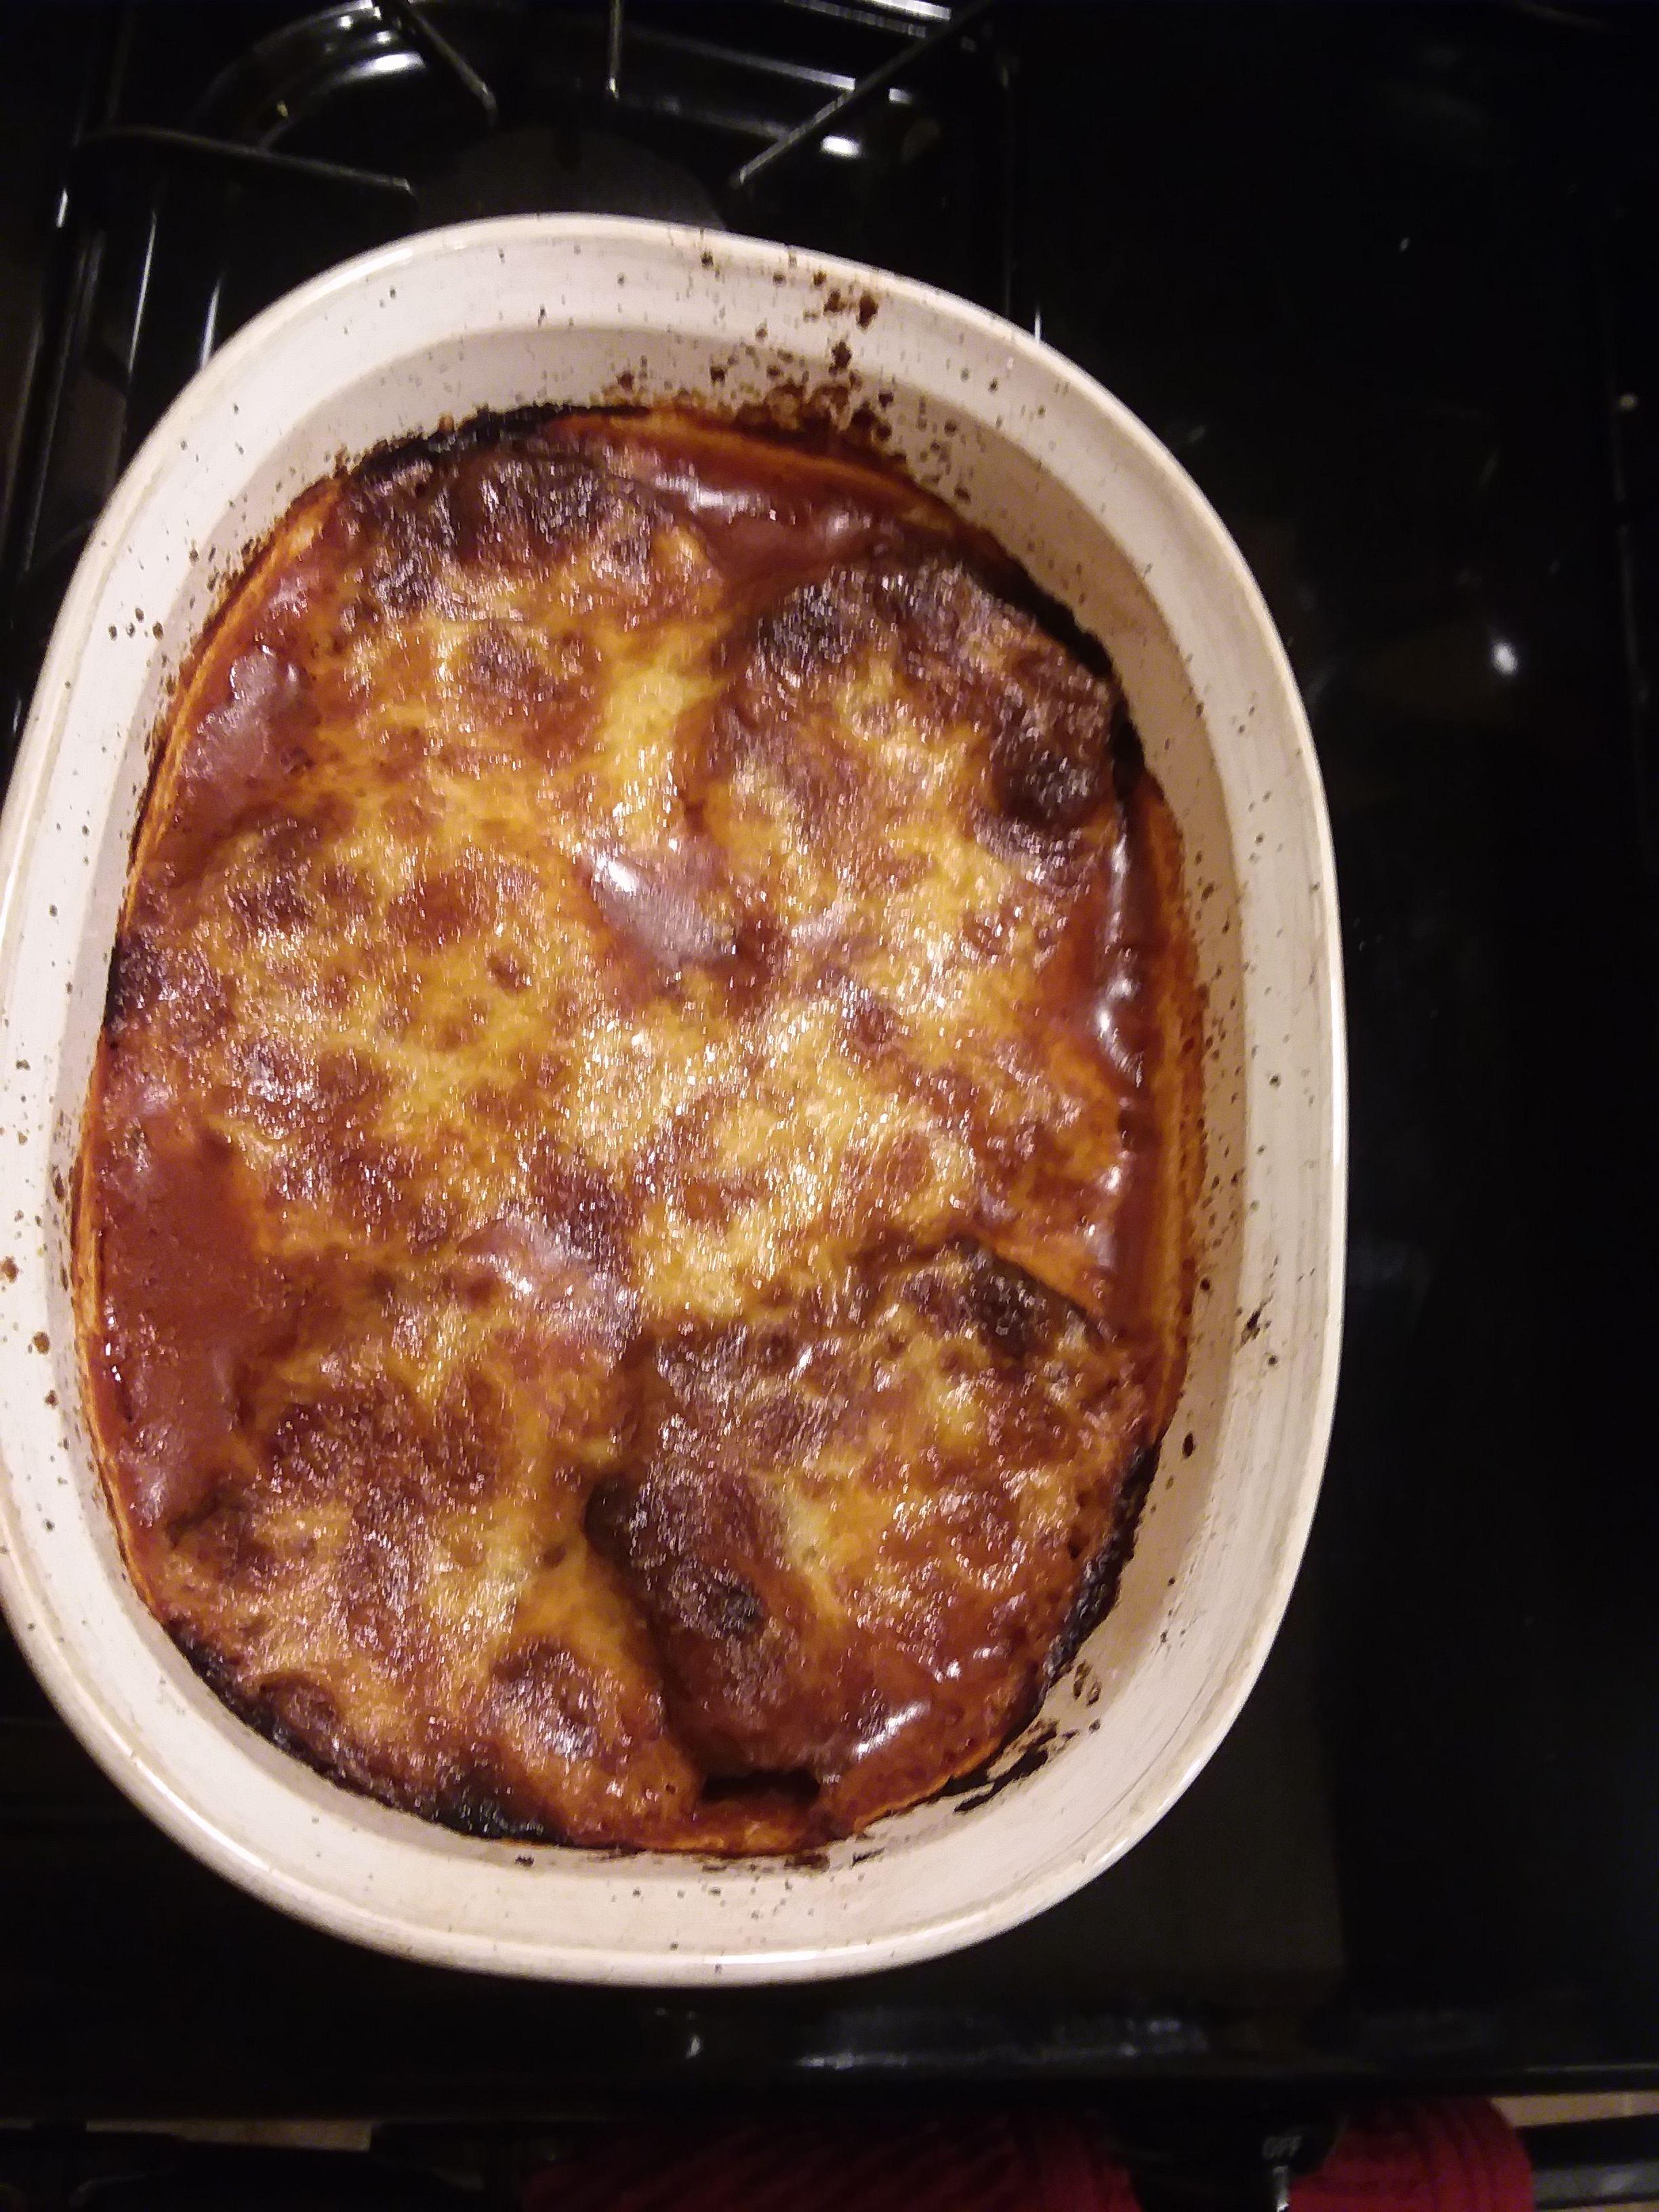 Zucchini Parmesan Recipe Eggplant parmesan, Zucchini